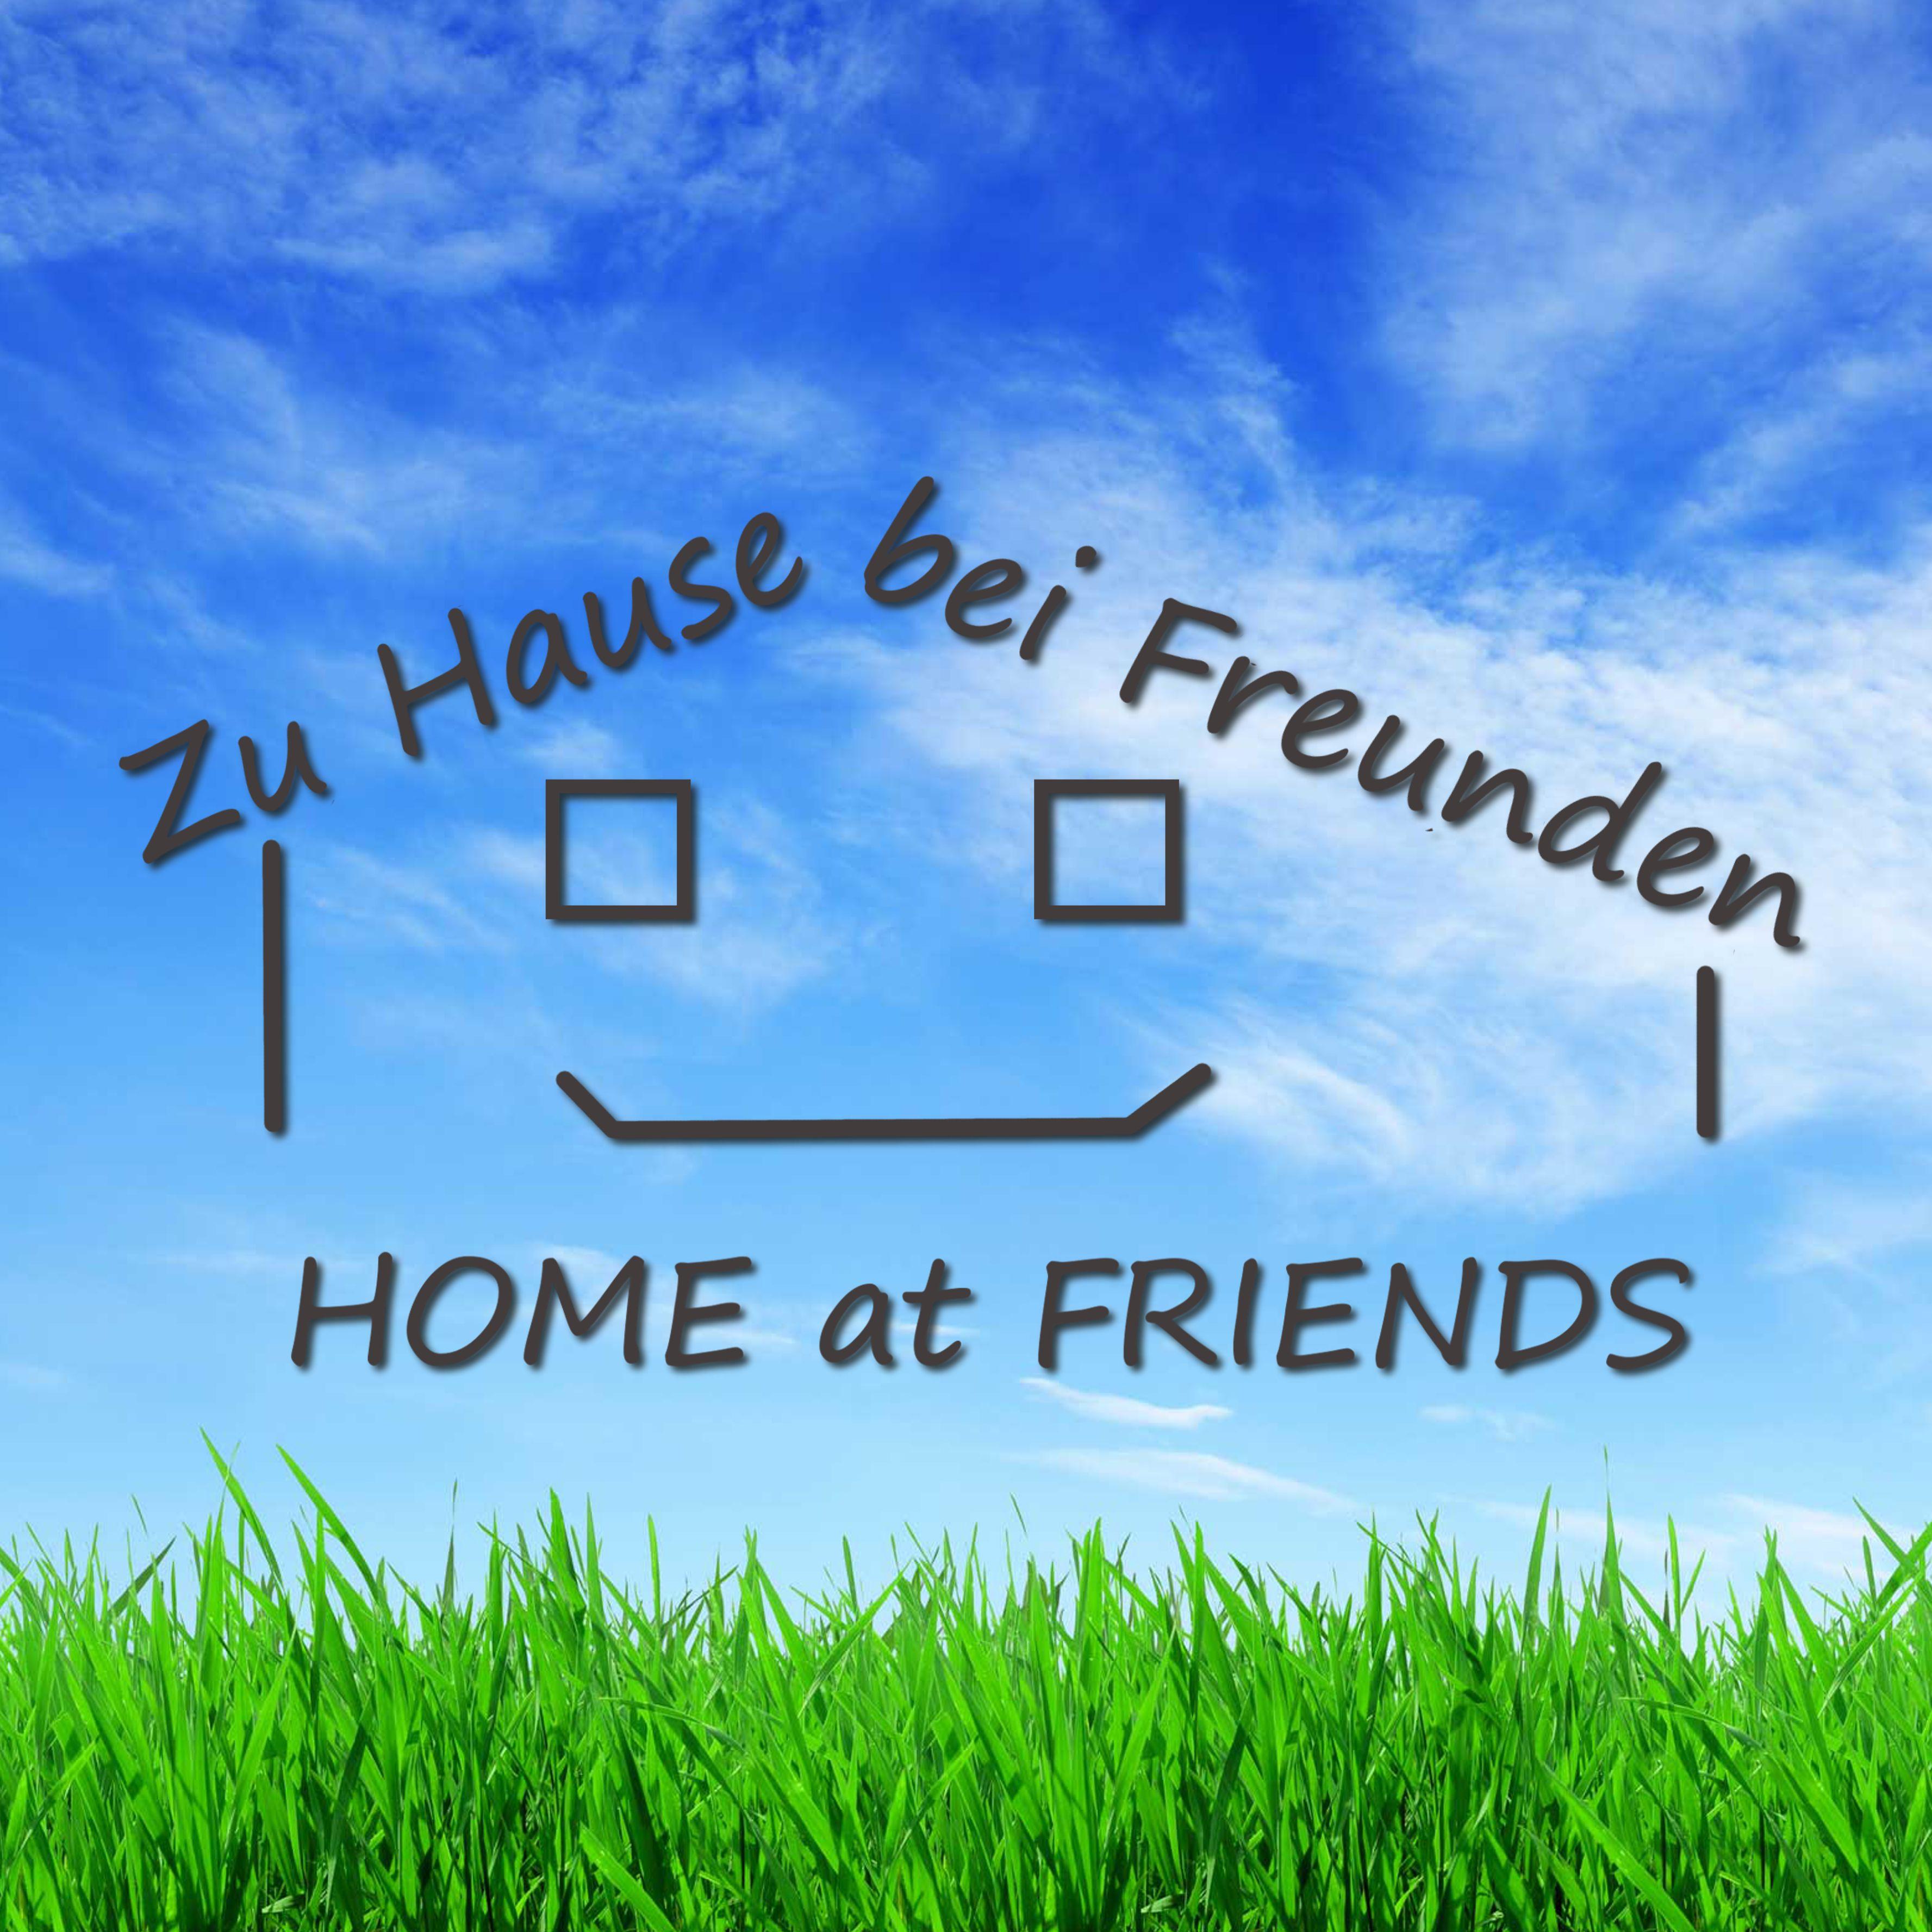 HOME at FRIENDS - Zu Hause bei Freunden